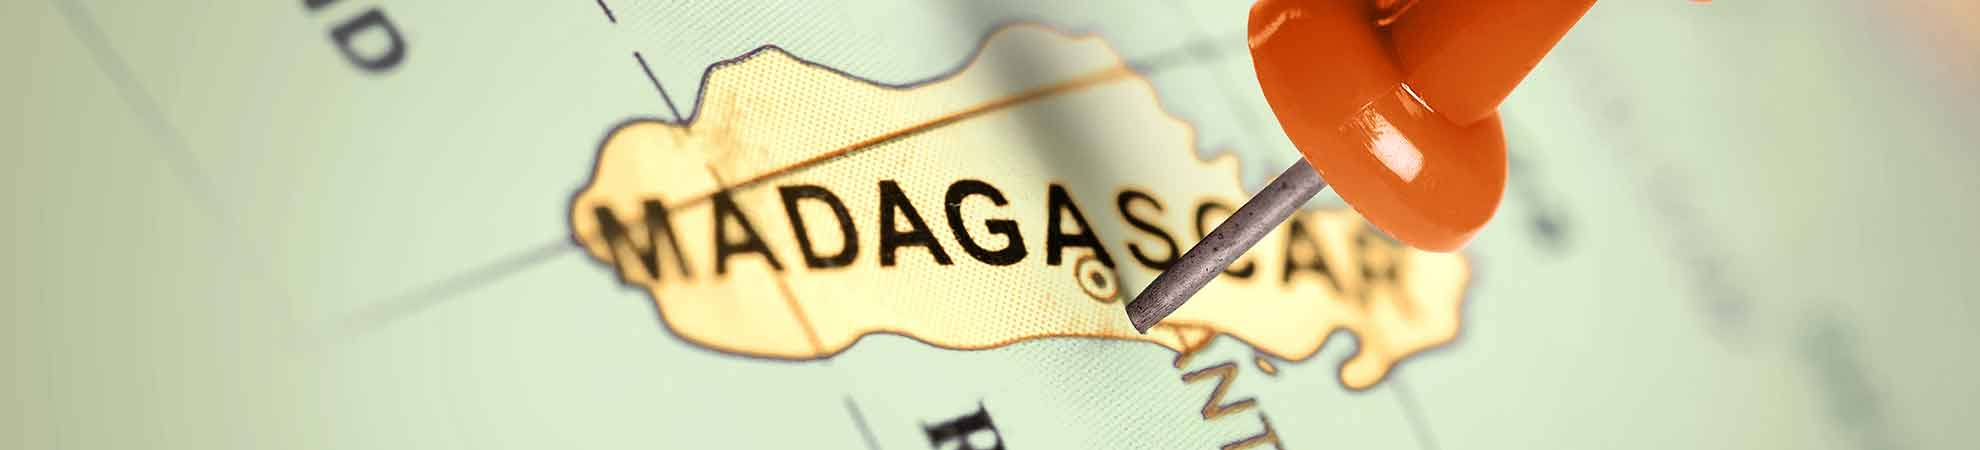 Formalités et visas a Madagascar